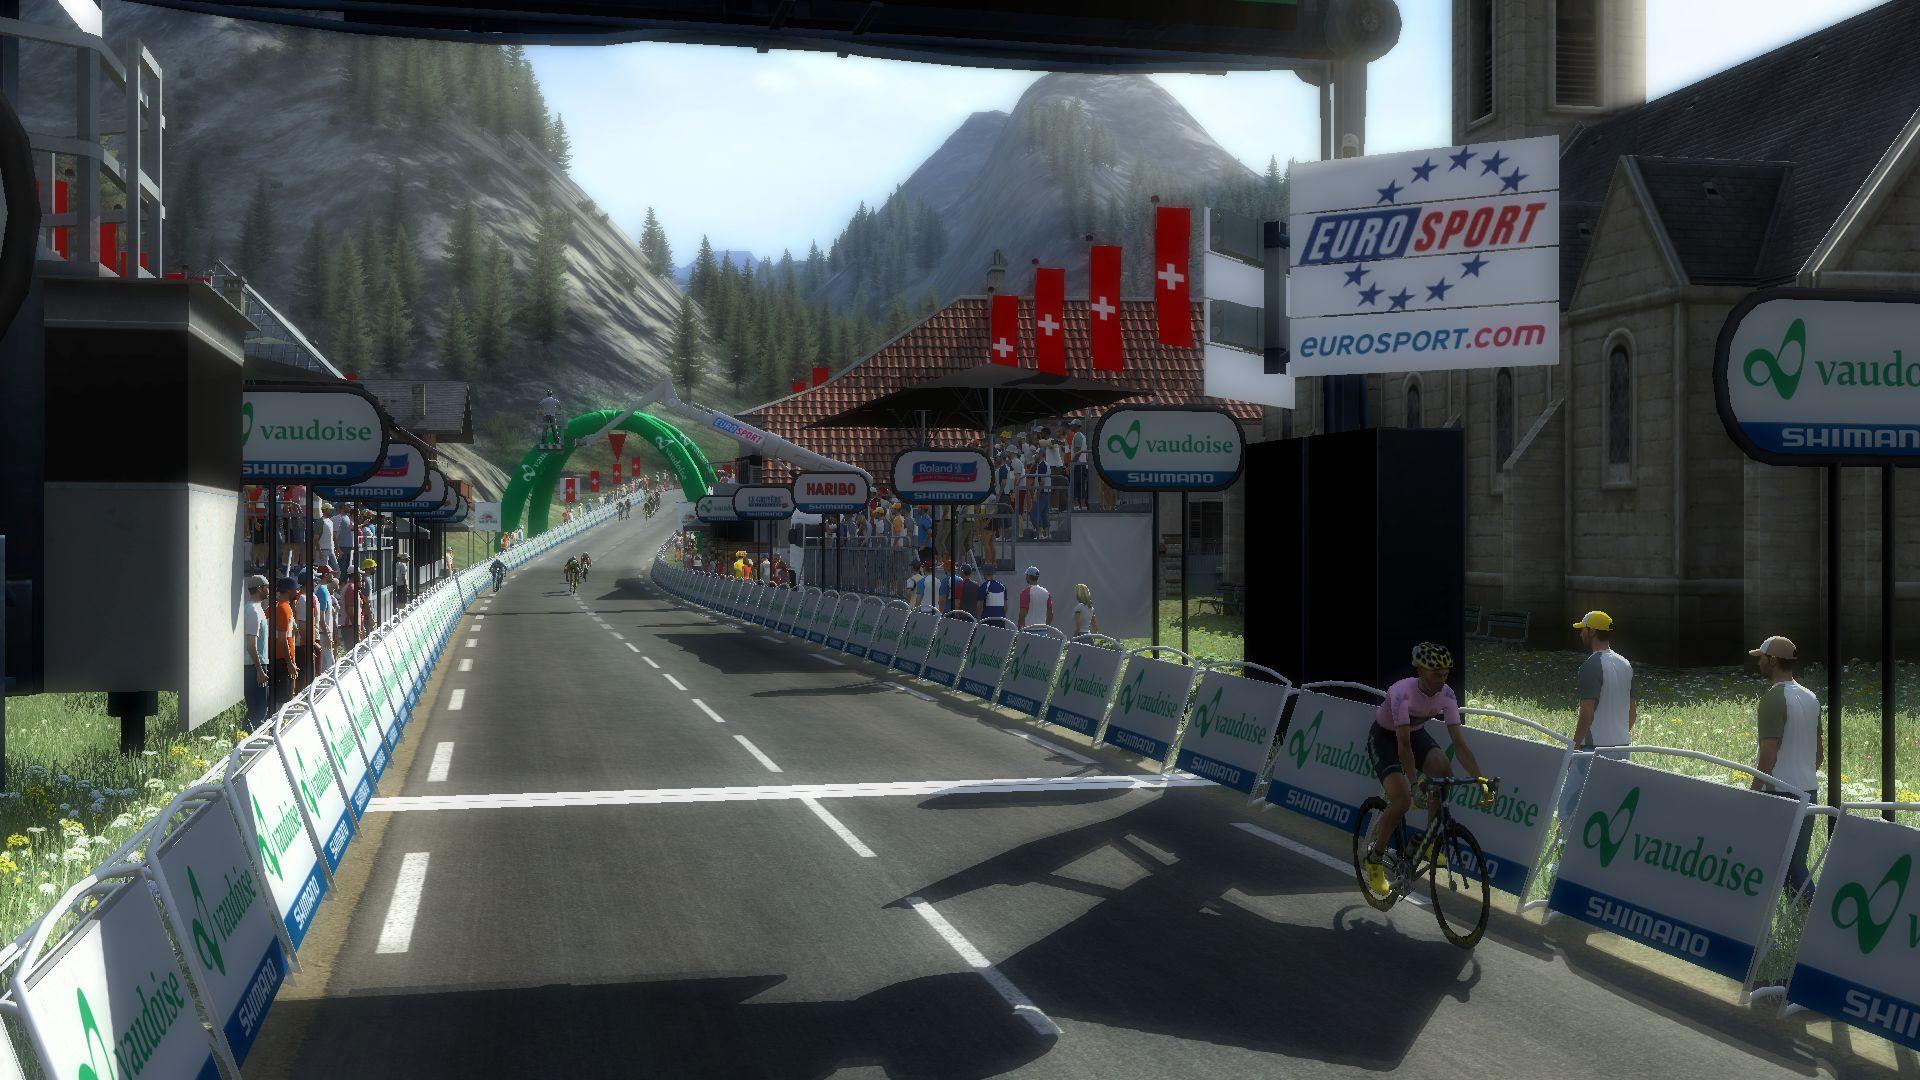 pcmdaily.com/images/mg/2017/Races/U23/Avenir/AVES7%2033.jpg